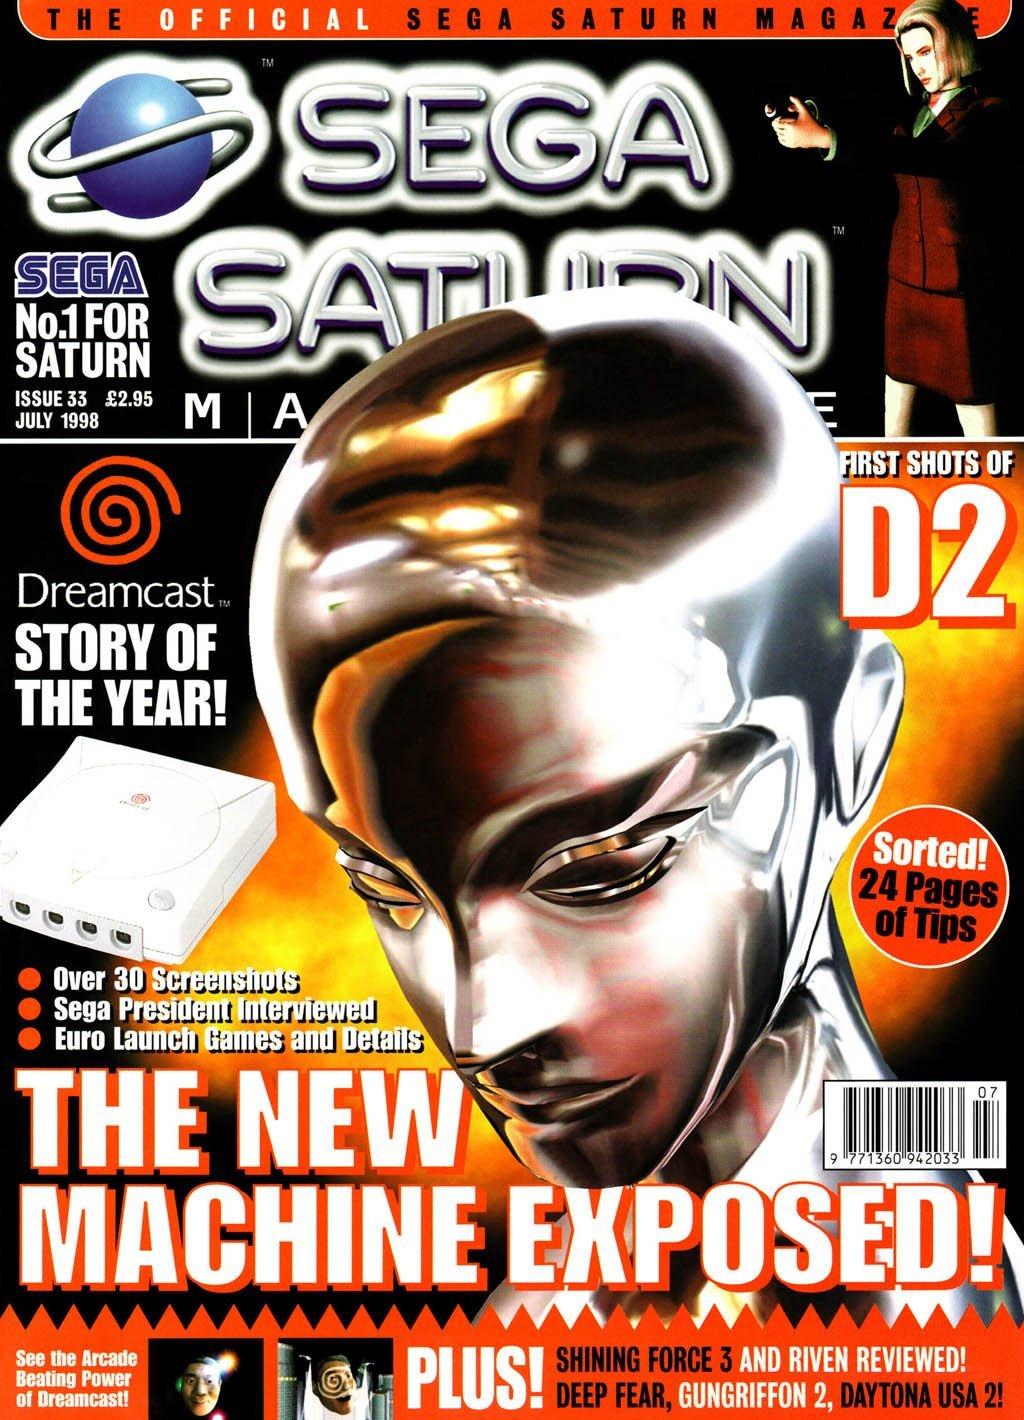 Official Sega Saturn Magazine 33 (July 1998)